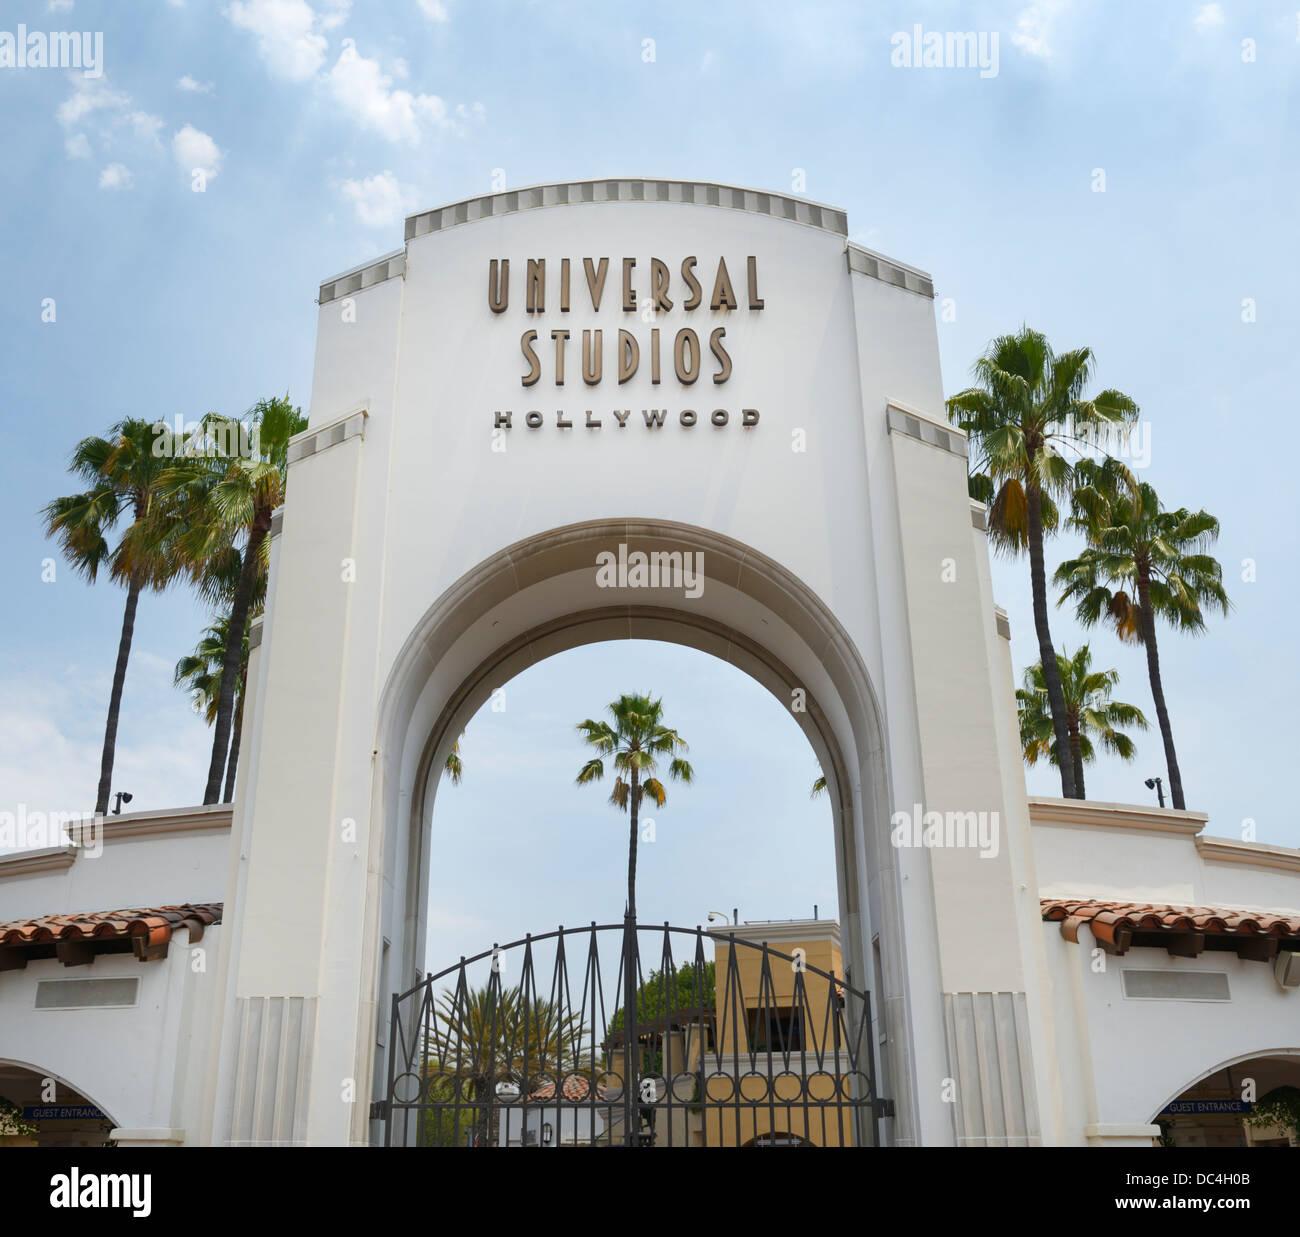 Universal Studios Eingang, Hollywood, CA Stockbild